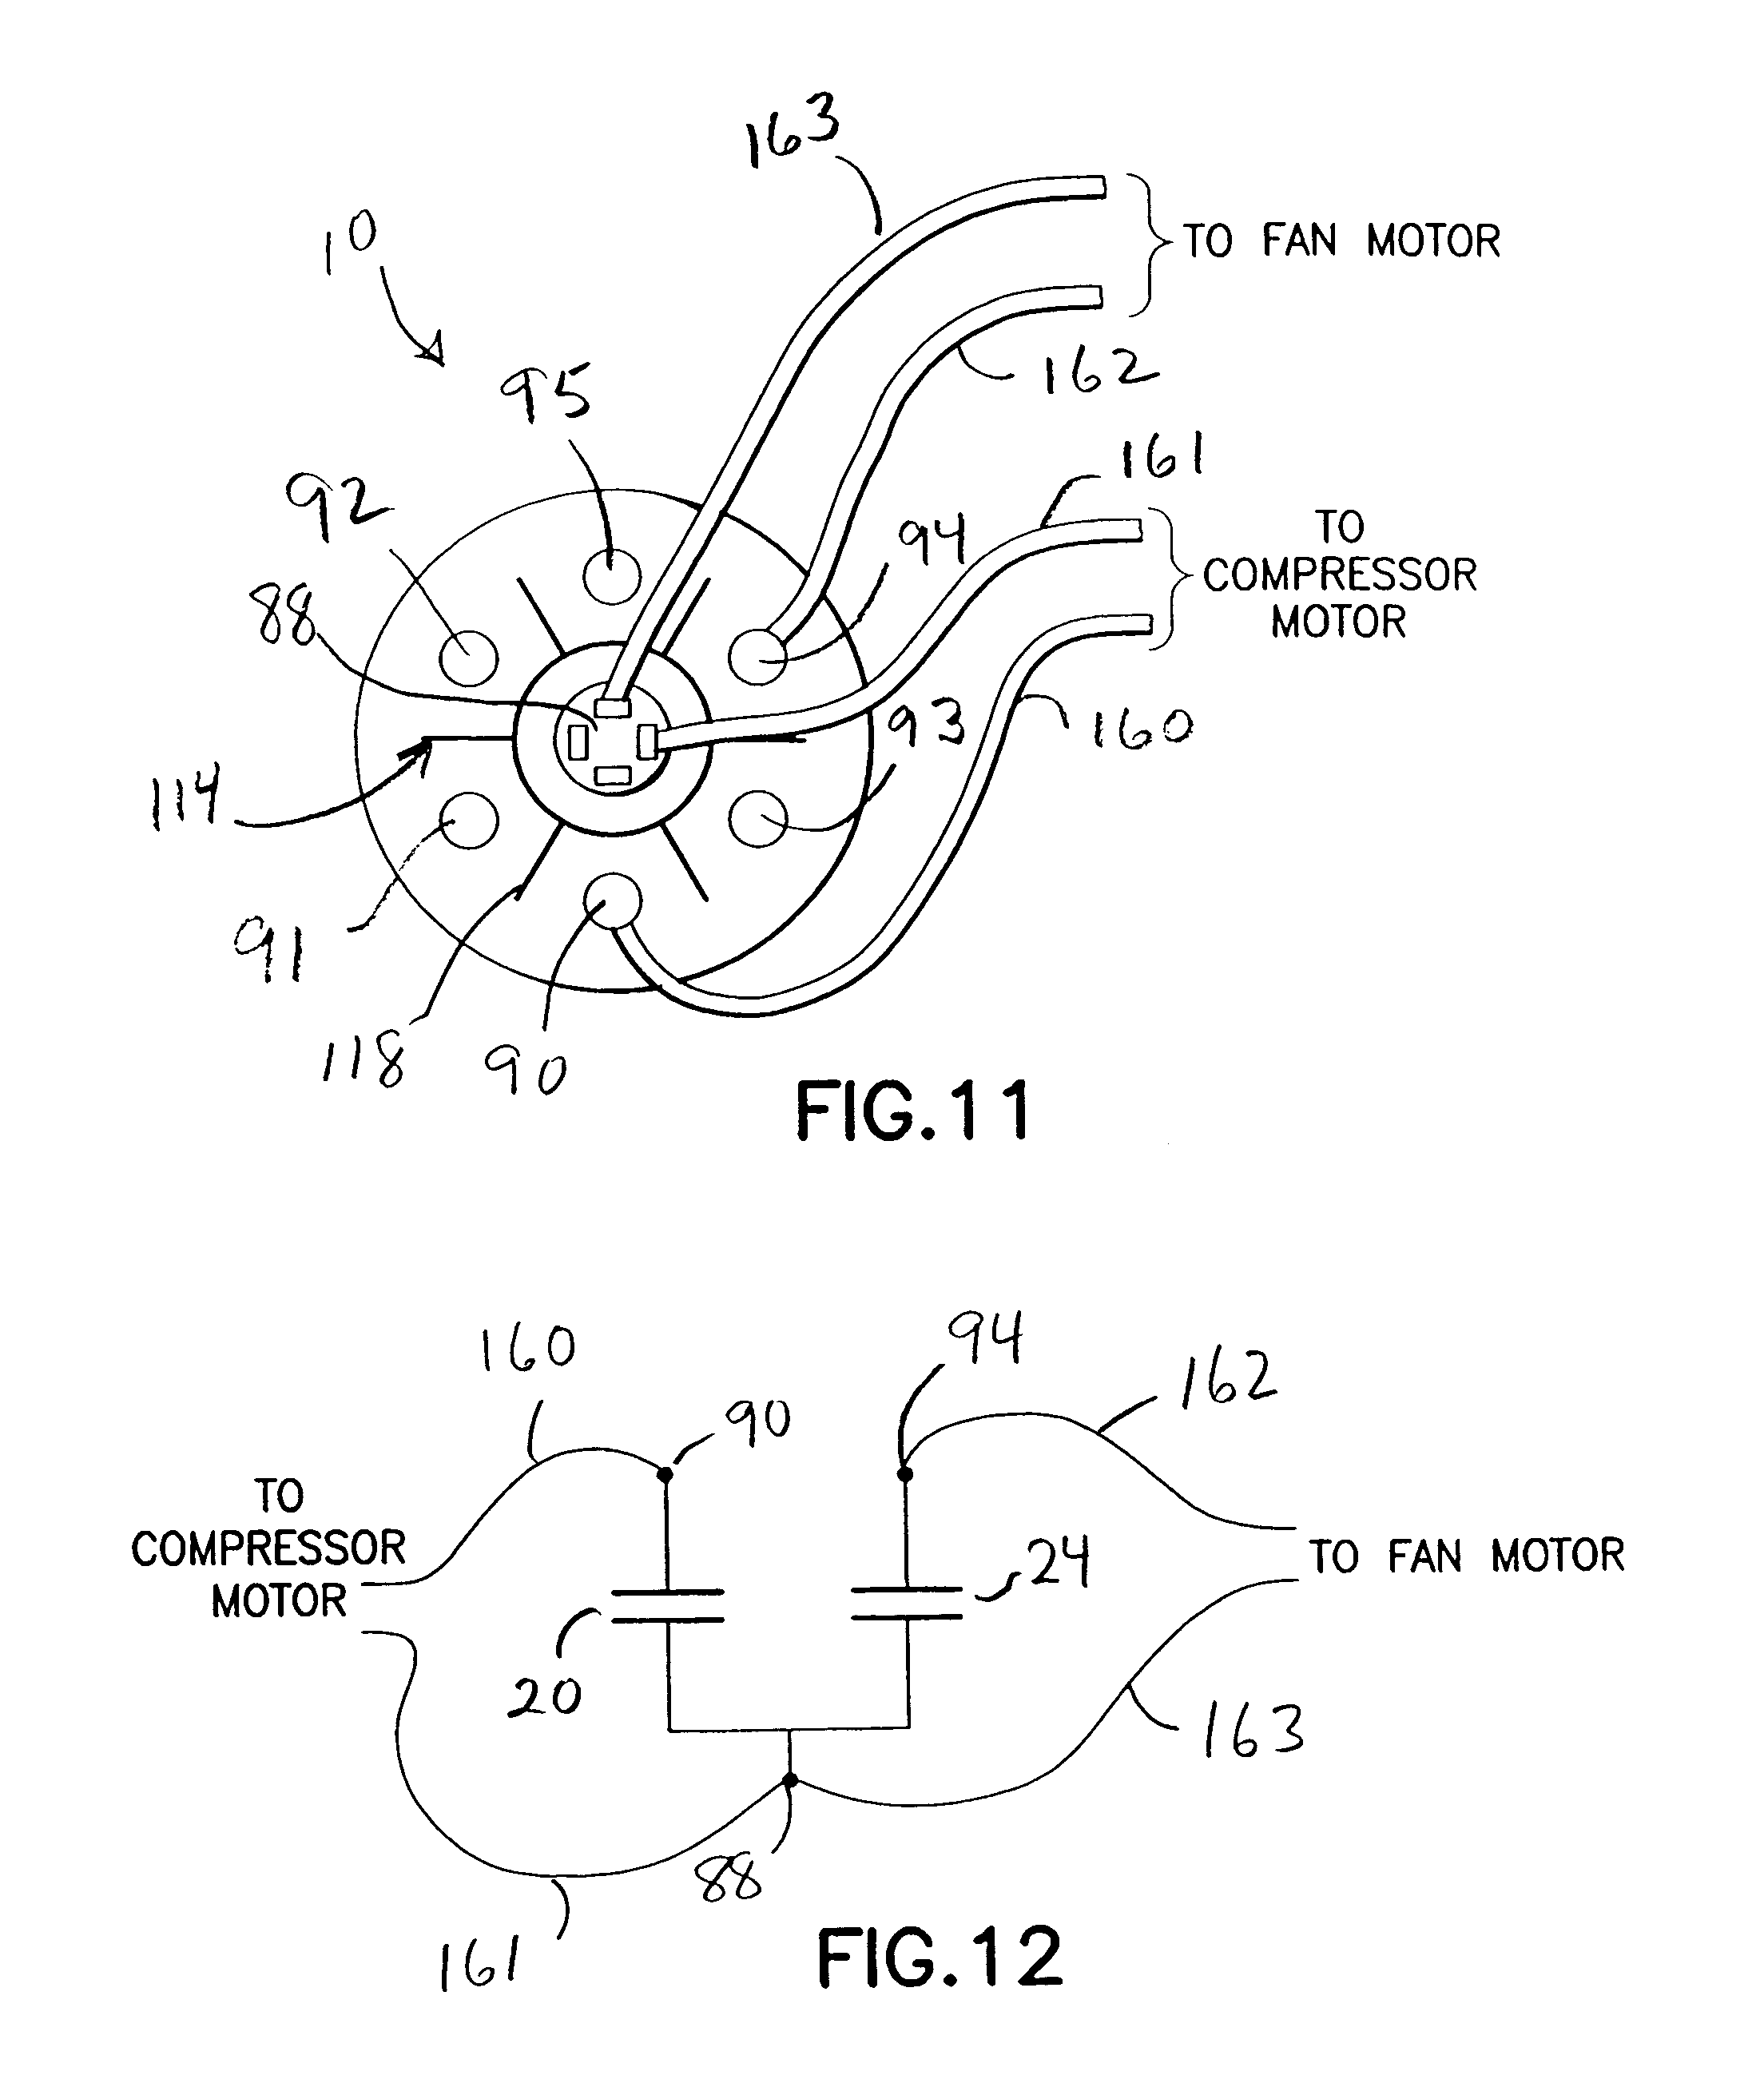 ducane oil furnace wiring diagram trailer light nz gas parts whirlpool